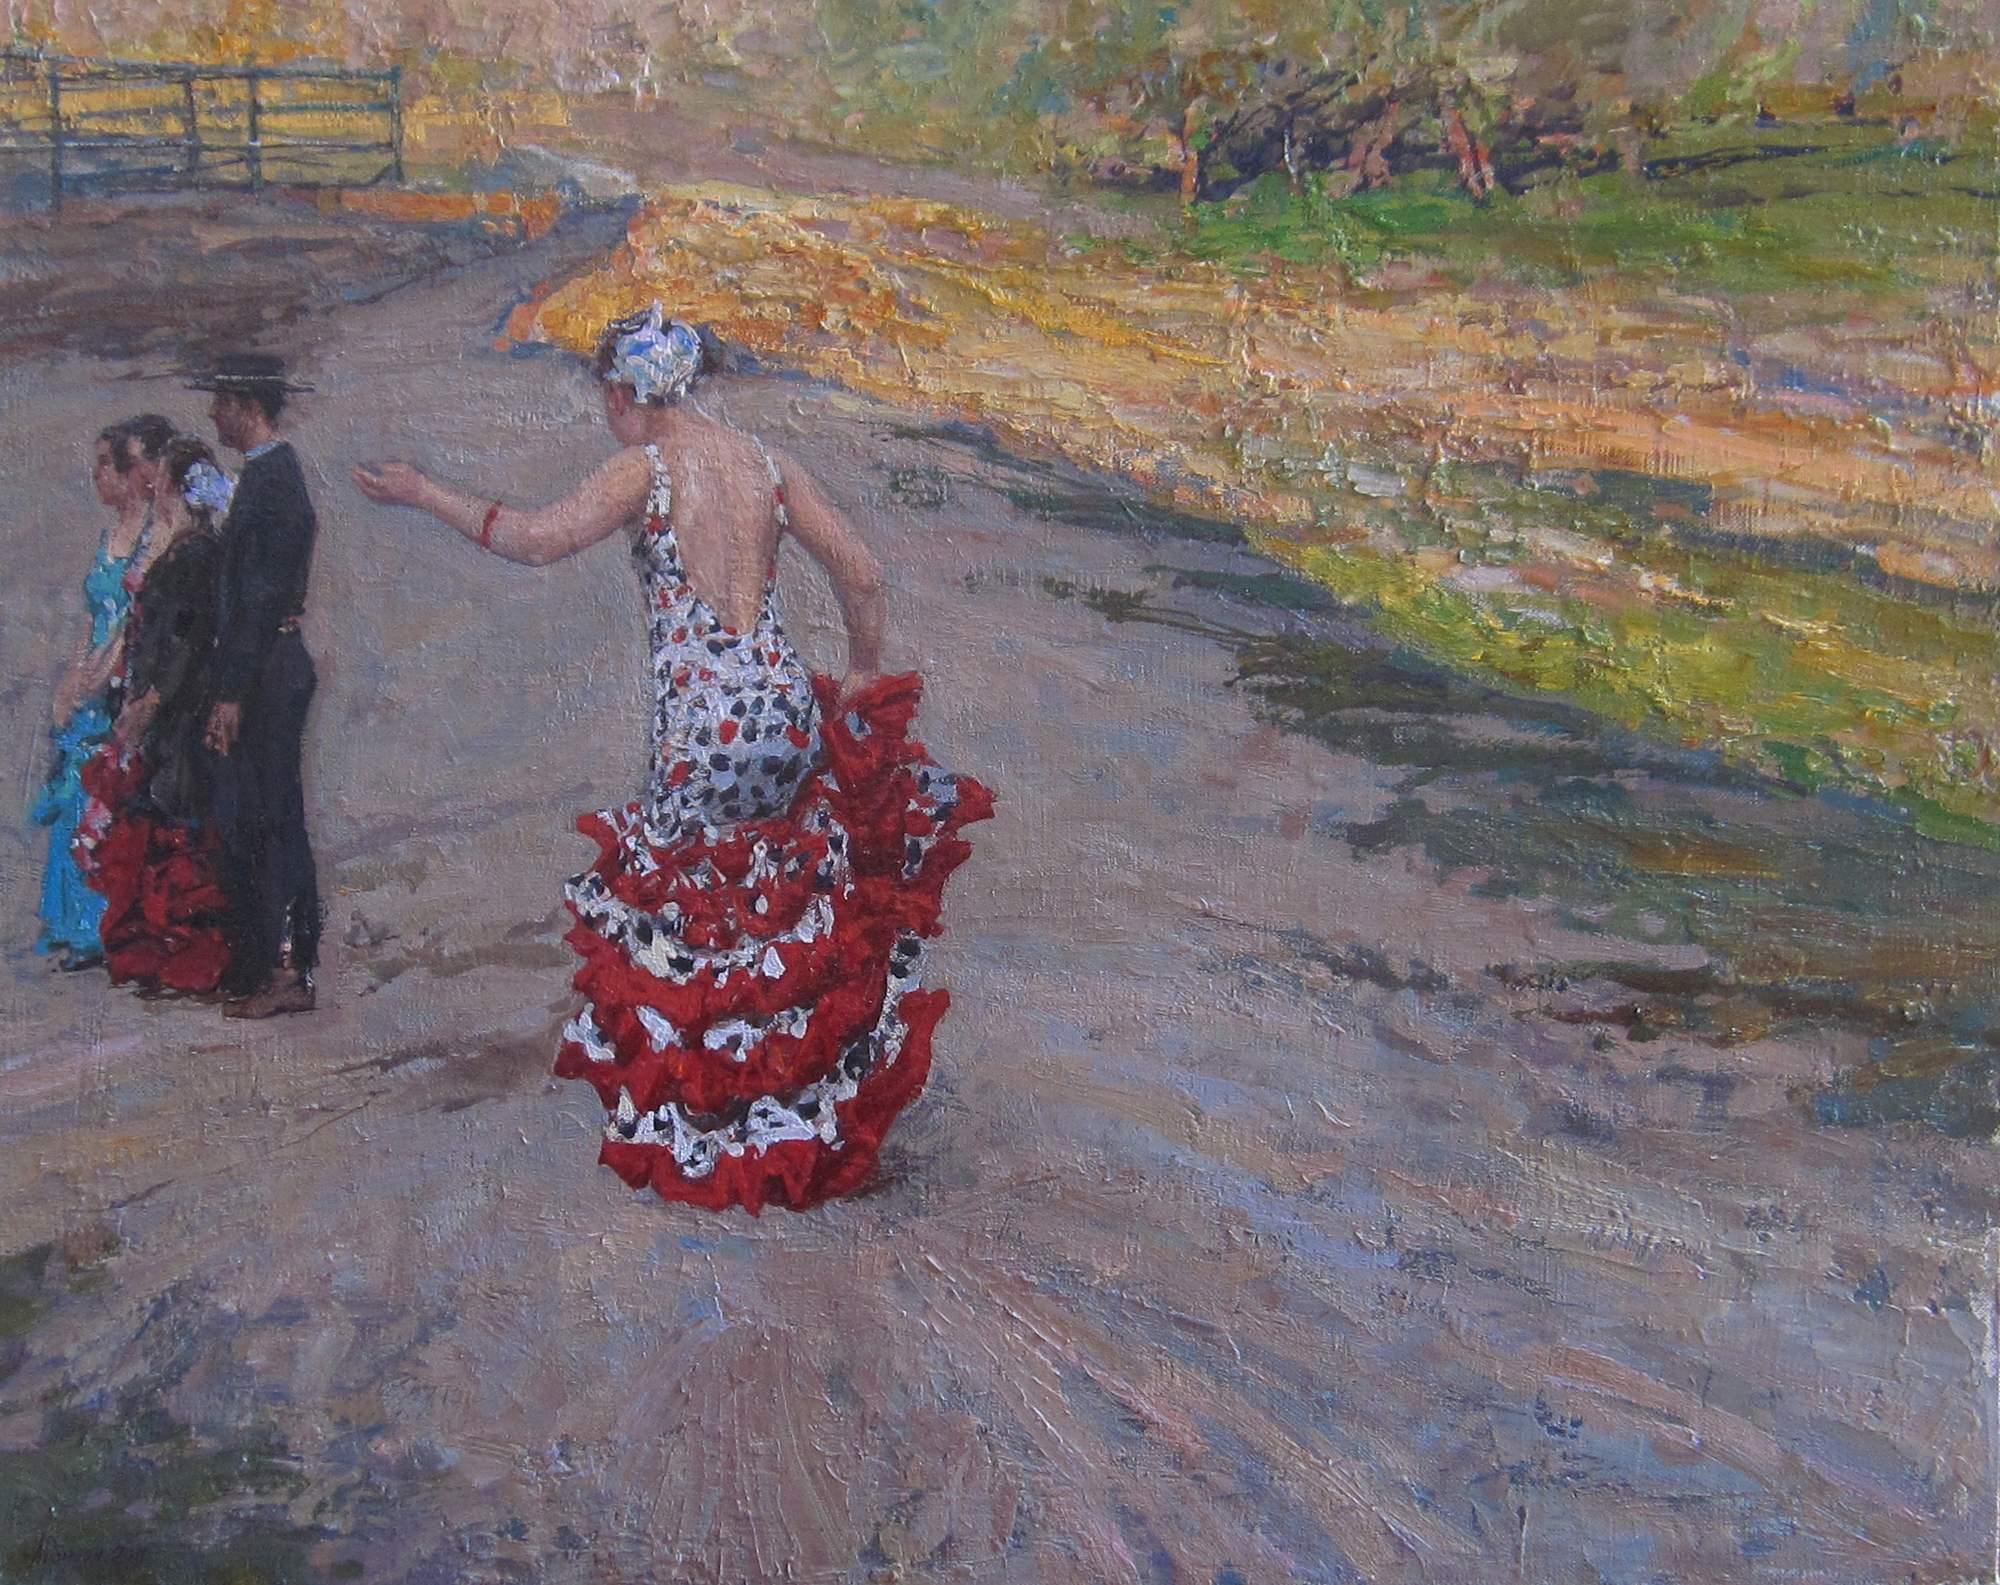 Catching Up by  Daud Akhriev - Masterpiece Online